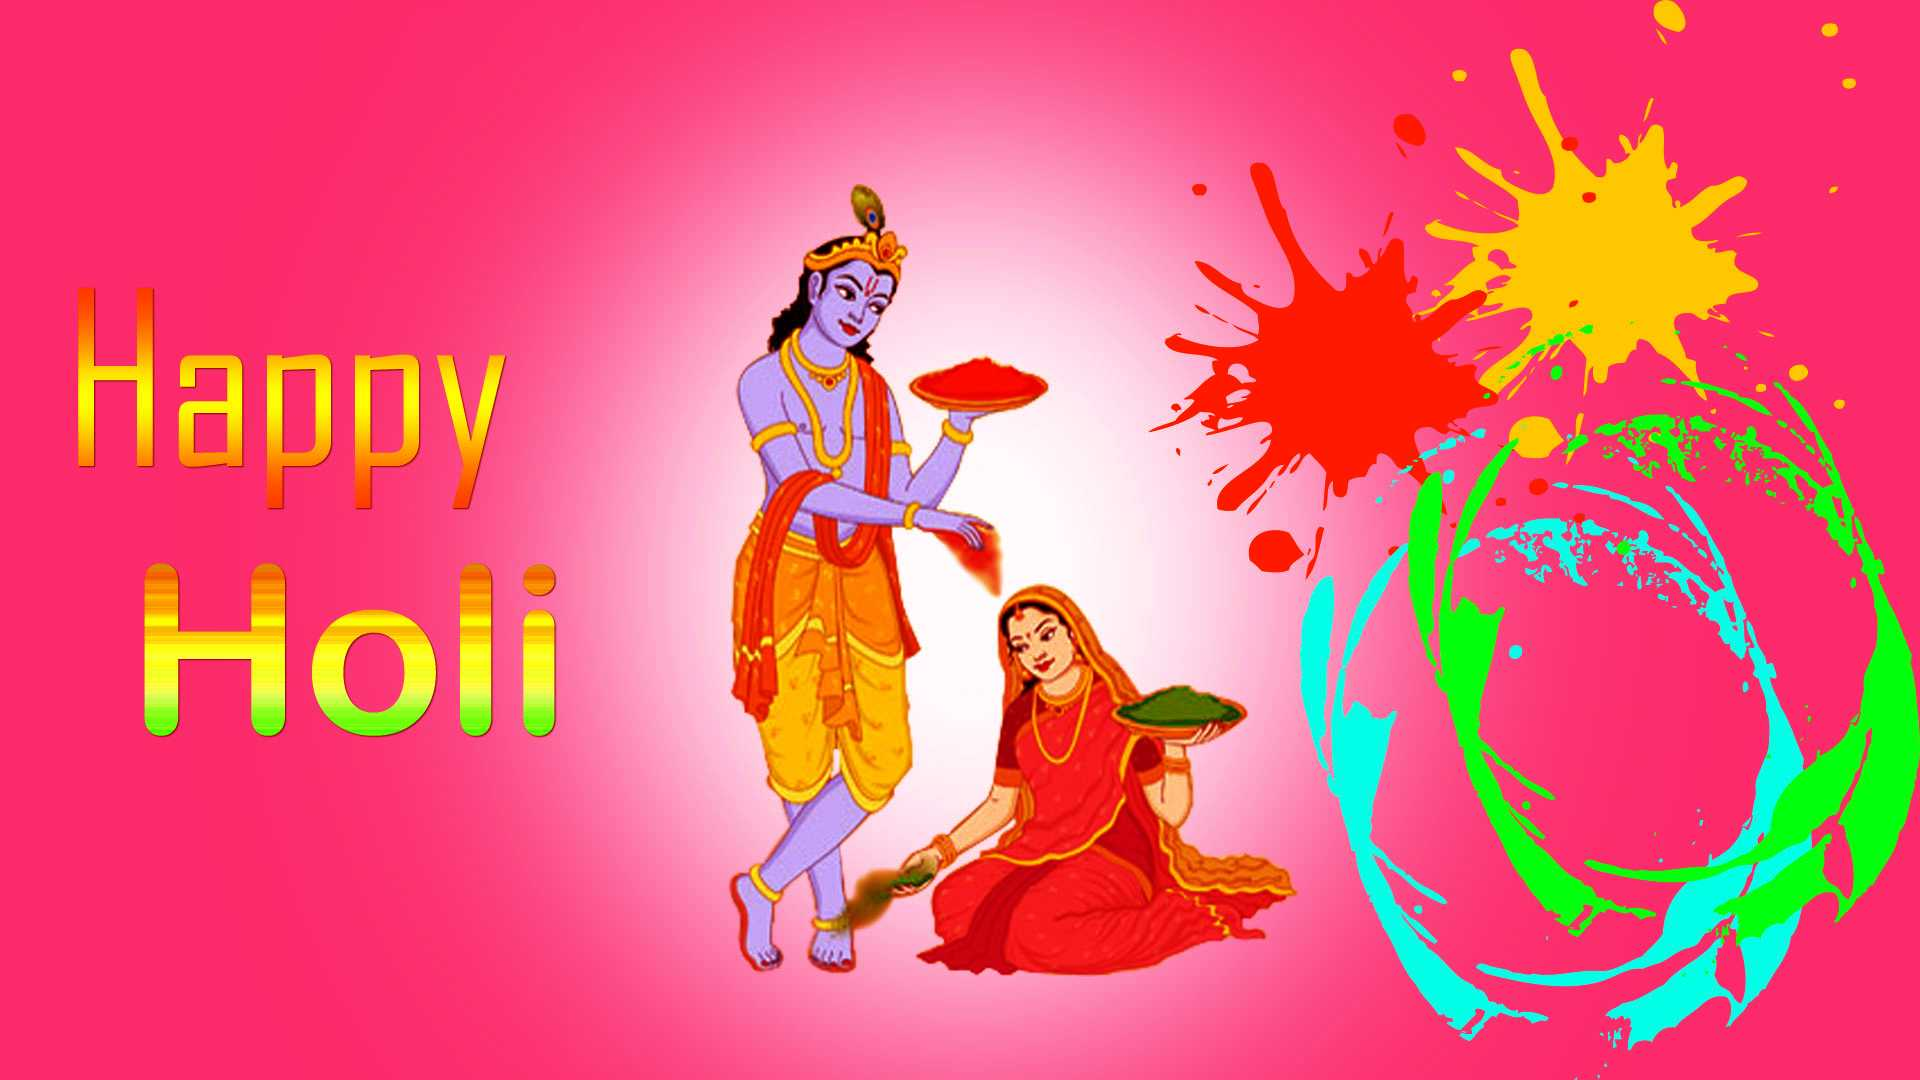 Radha Krishna Romantic Holi Wallpaper Photo Picture HD Download - Radha Krishna Romantic Holi Wallpaper Photo Picture HD Download